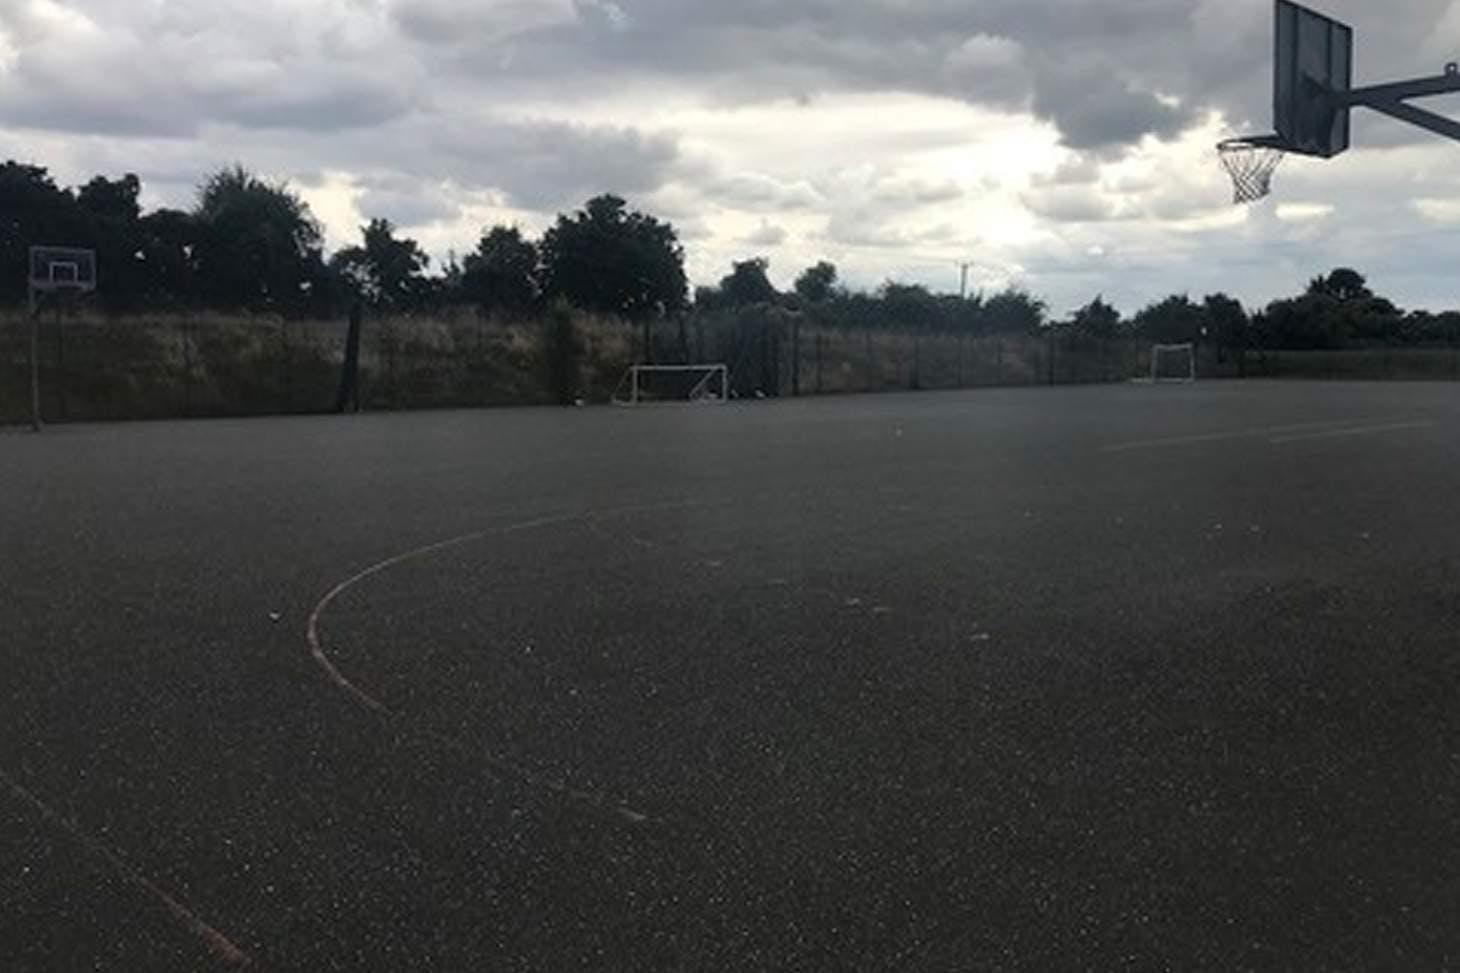 Princes Risborough School 5 a side | Concrete football pitch